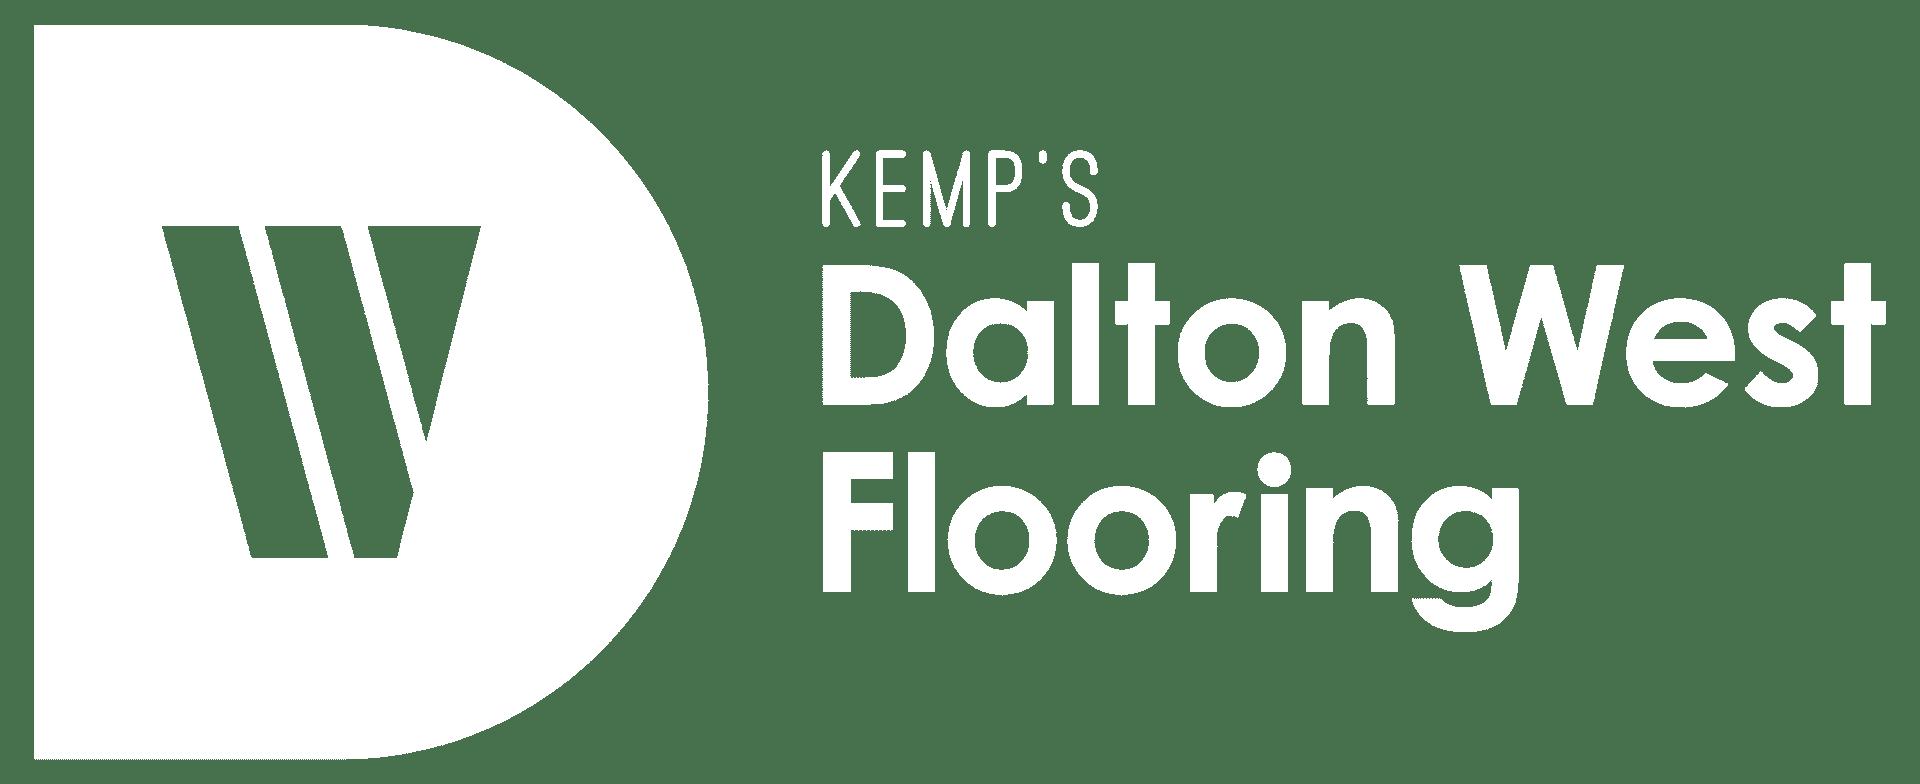 Kemp S Dalton West Flooring Harbinger Marketing